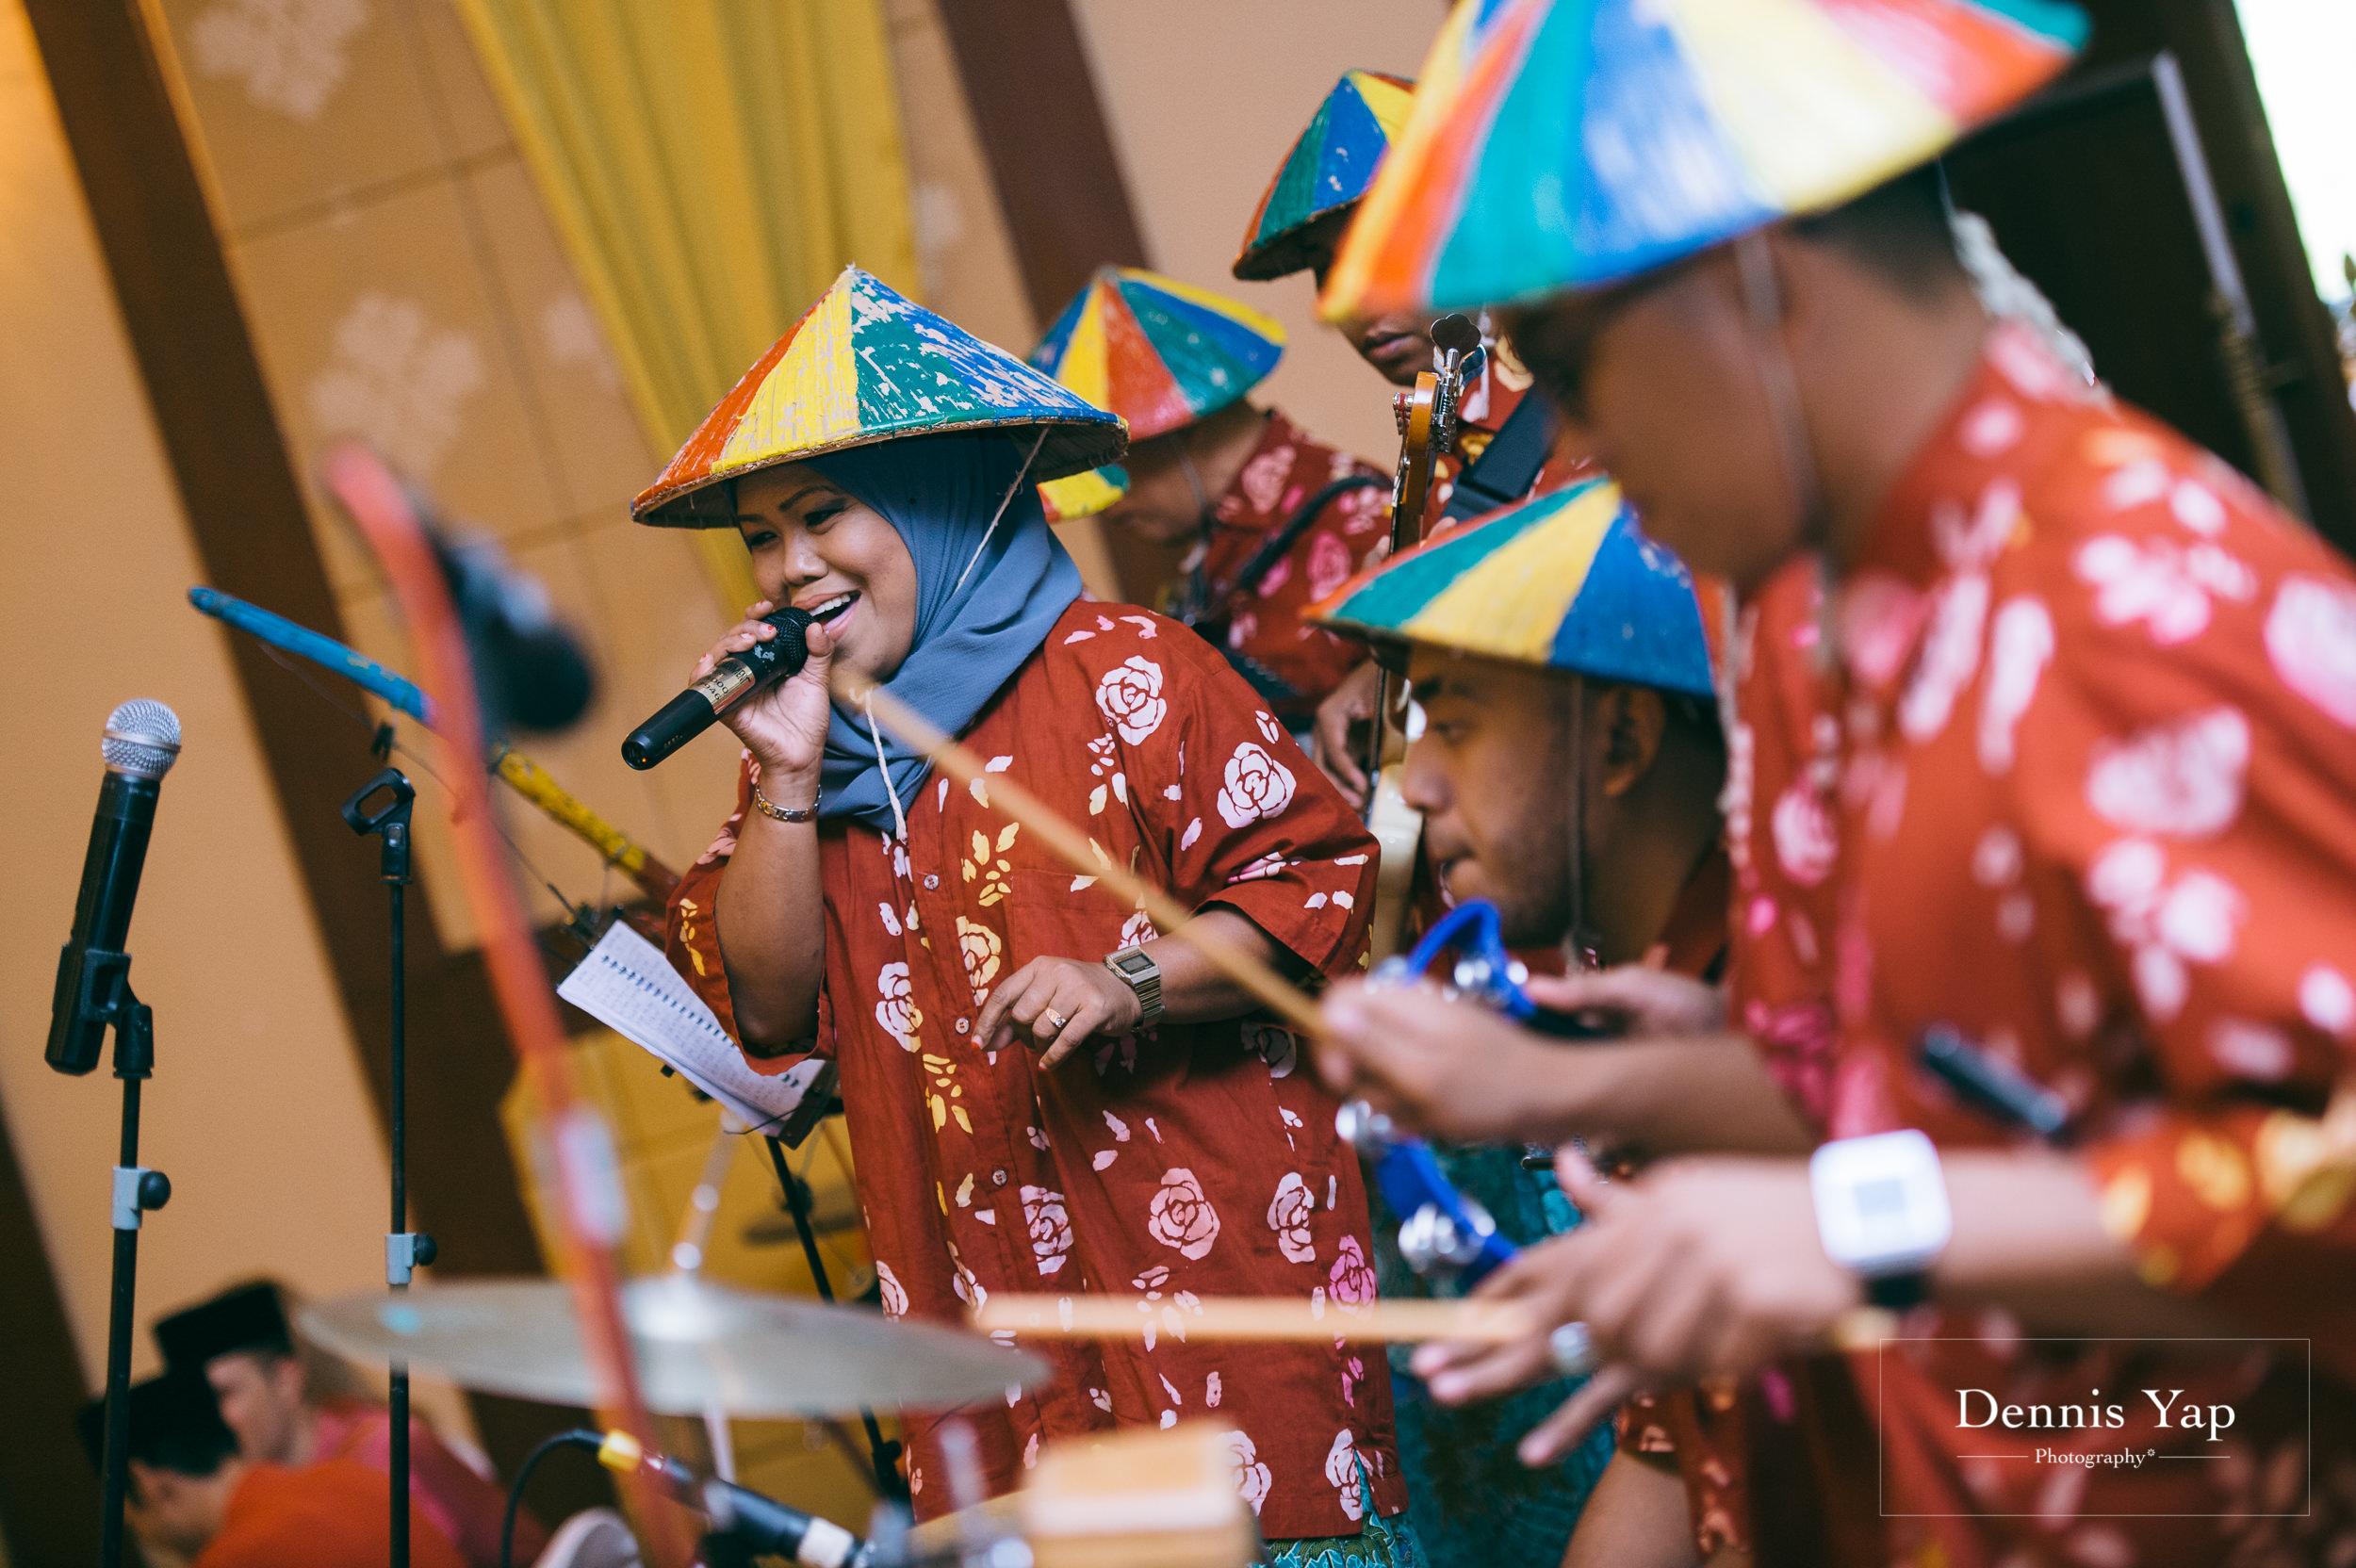 zarif hanalili malay wedding blessing ceremony dennis yap photography-20.jpg